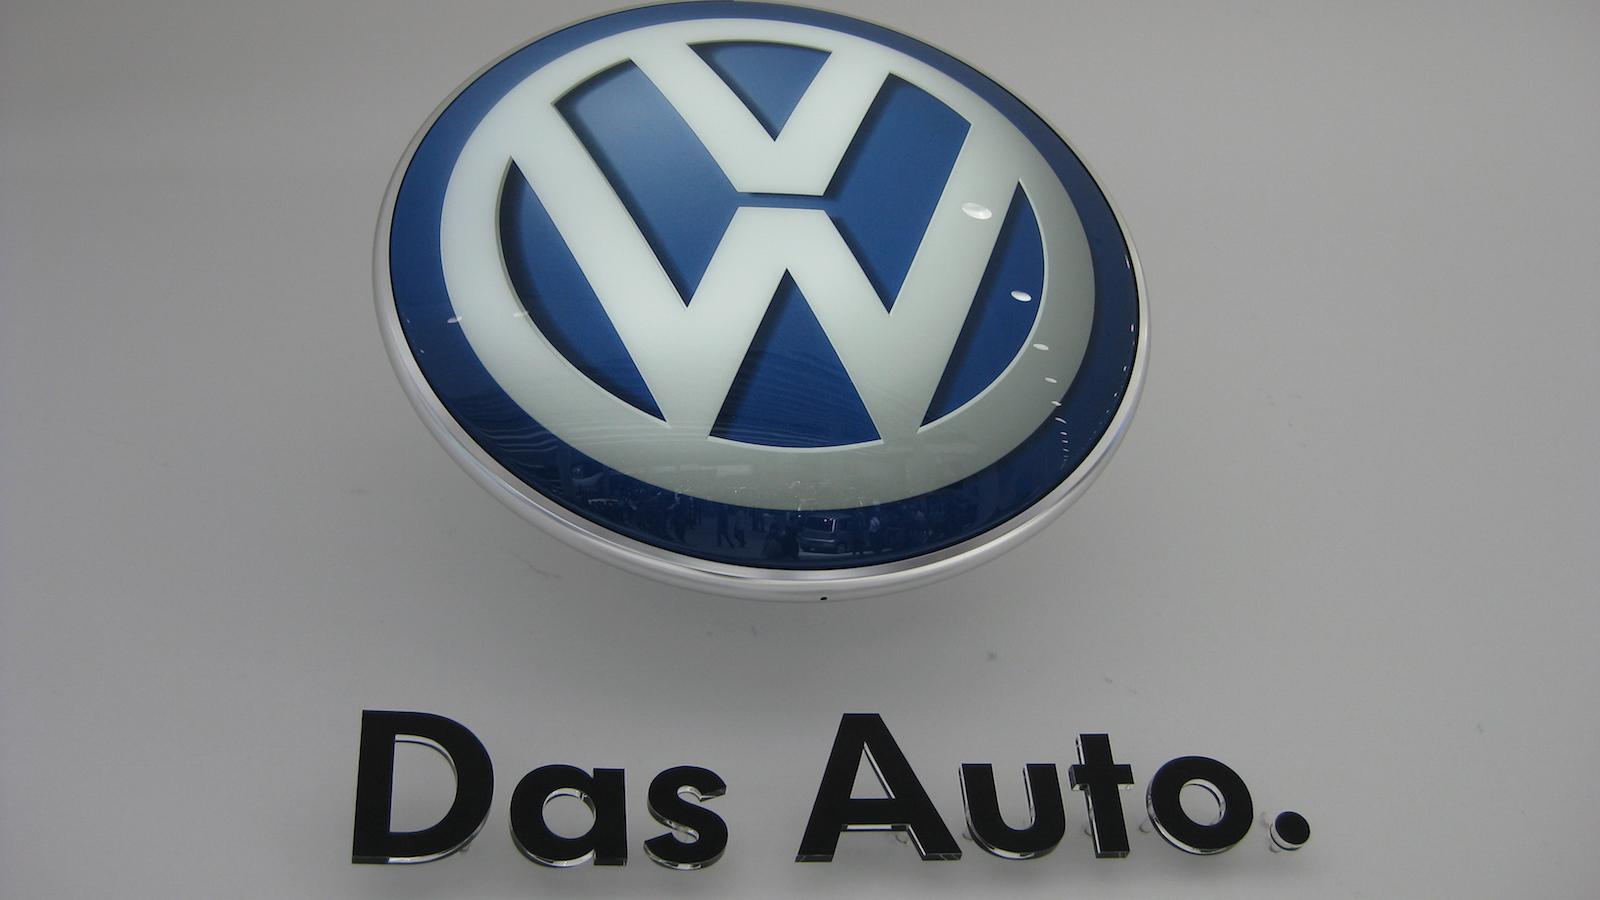 Volkswagen S New Slogan Is A Lesson In Humility Quartz